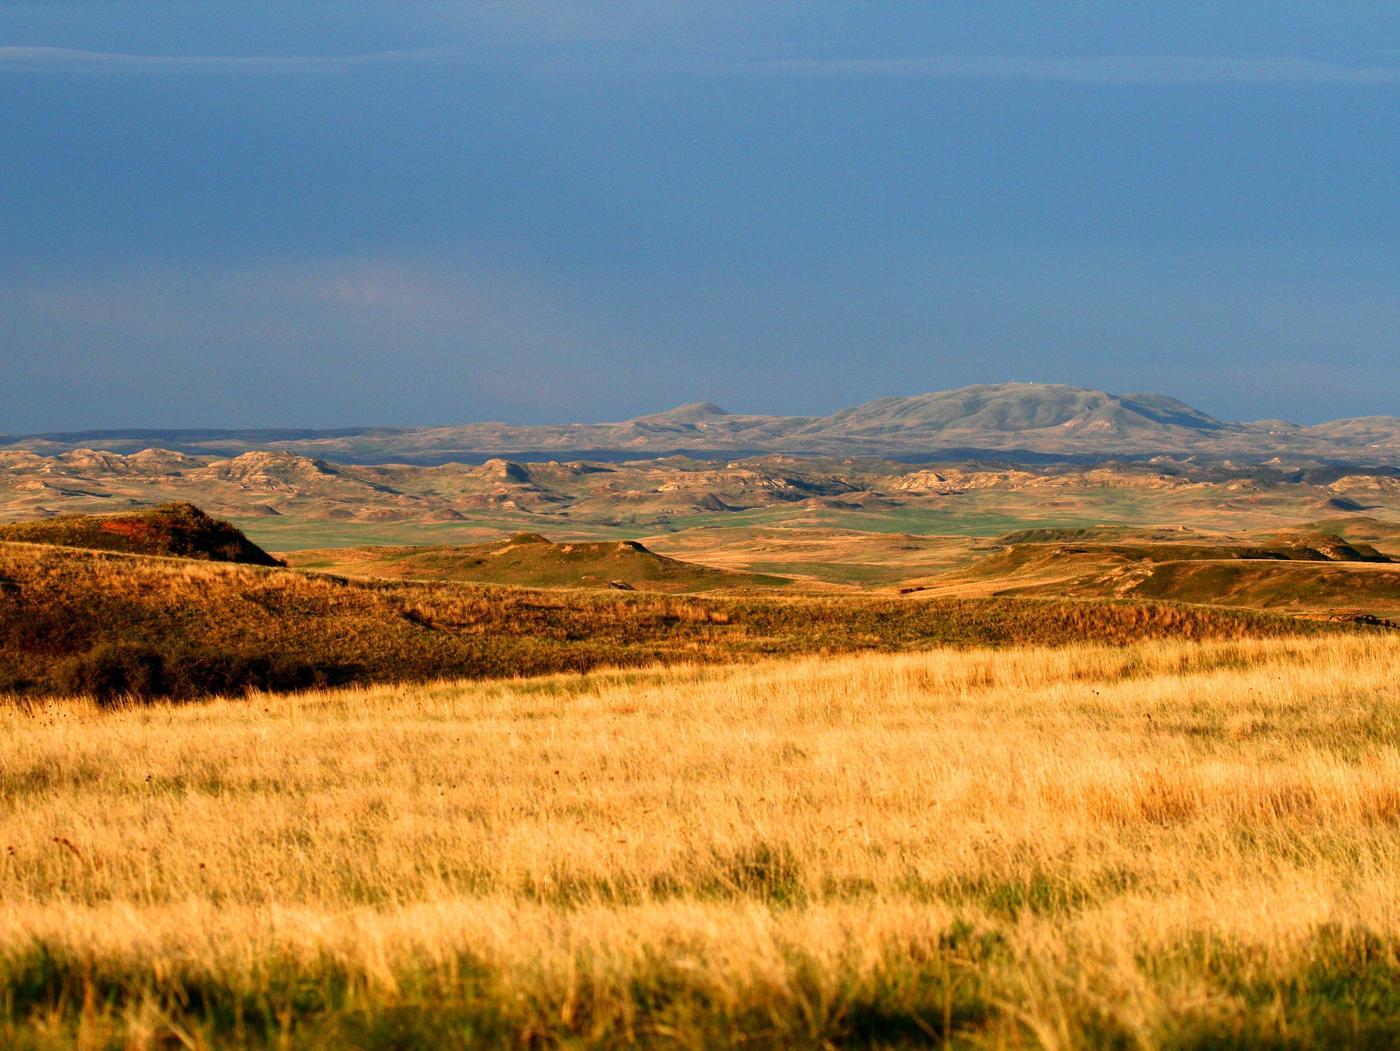 Dakota Prairie National Grasslands